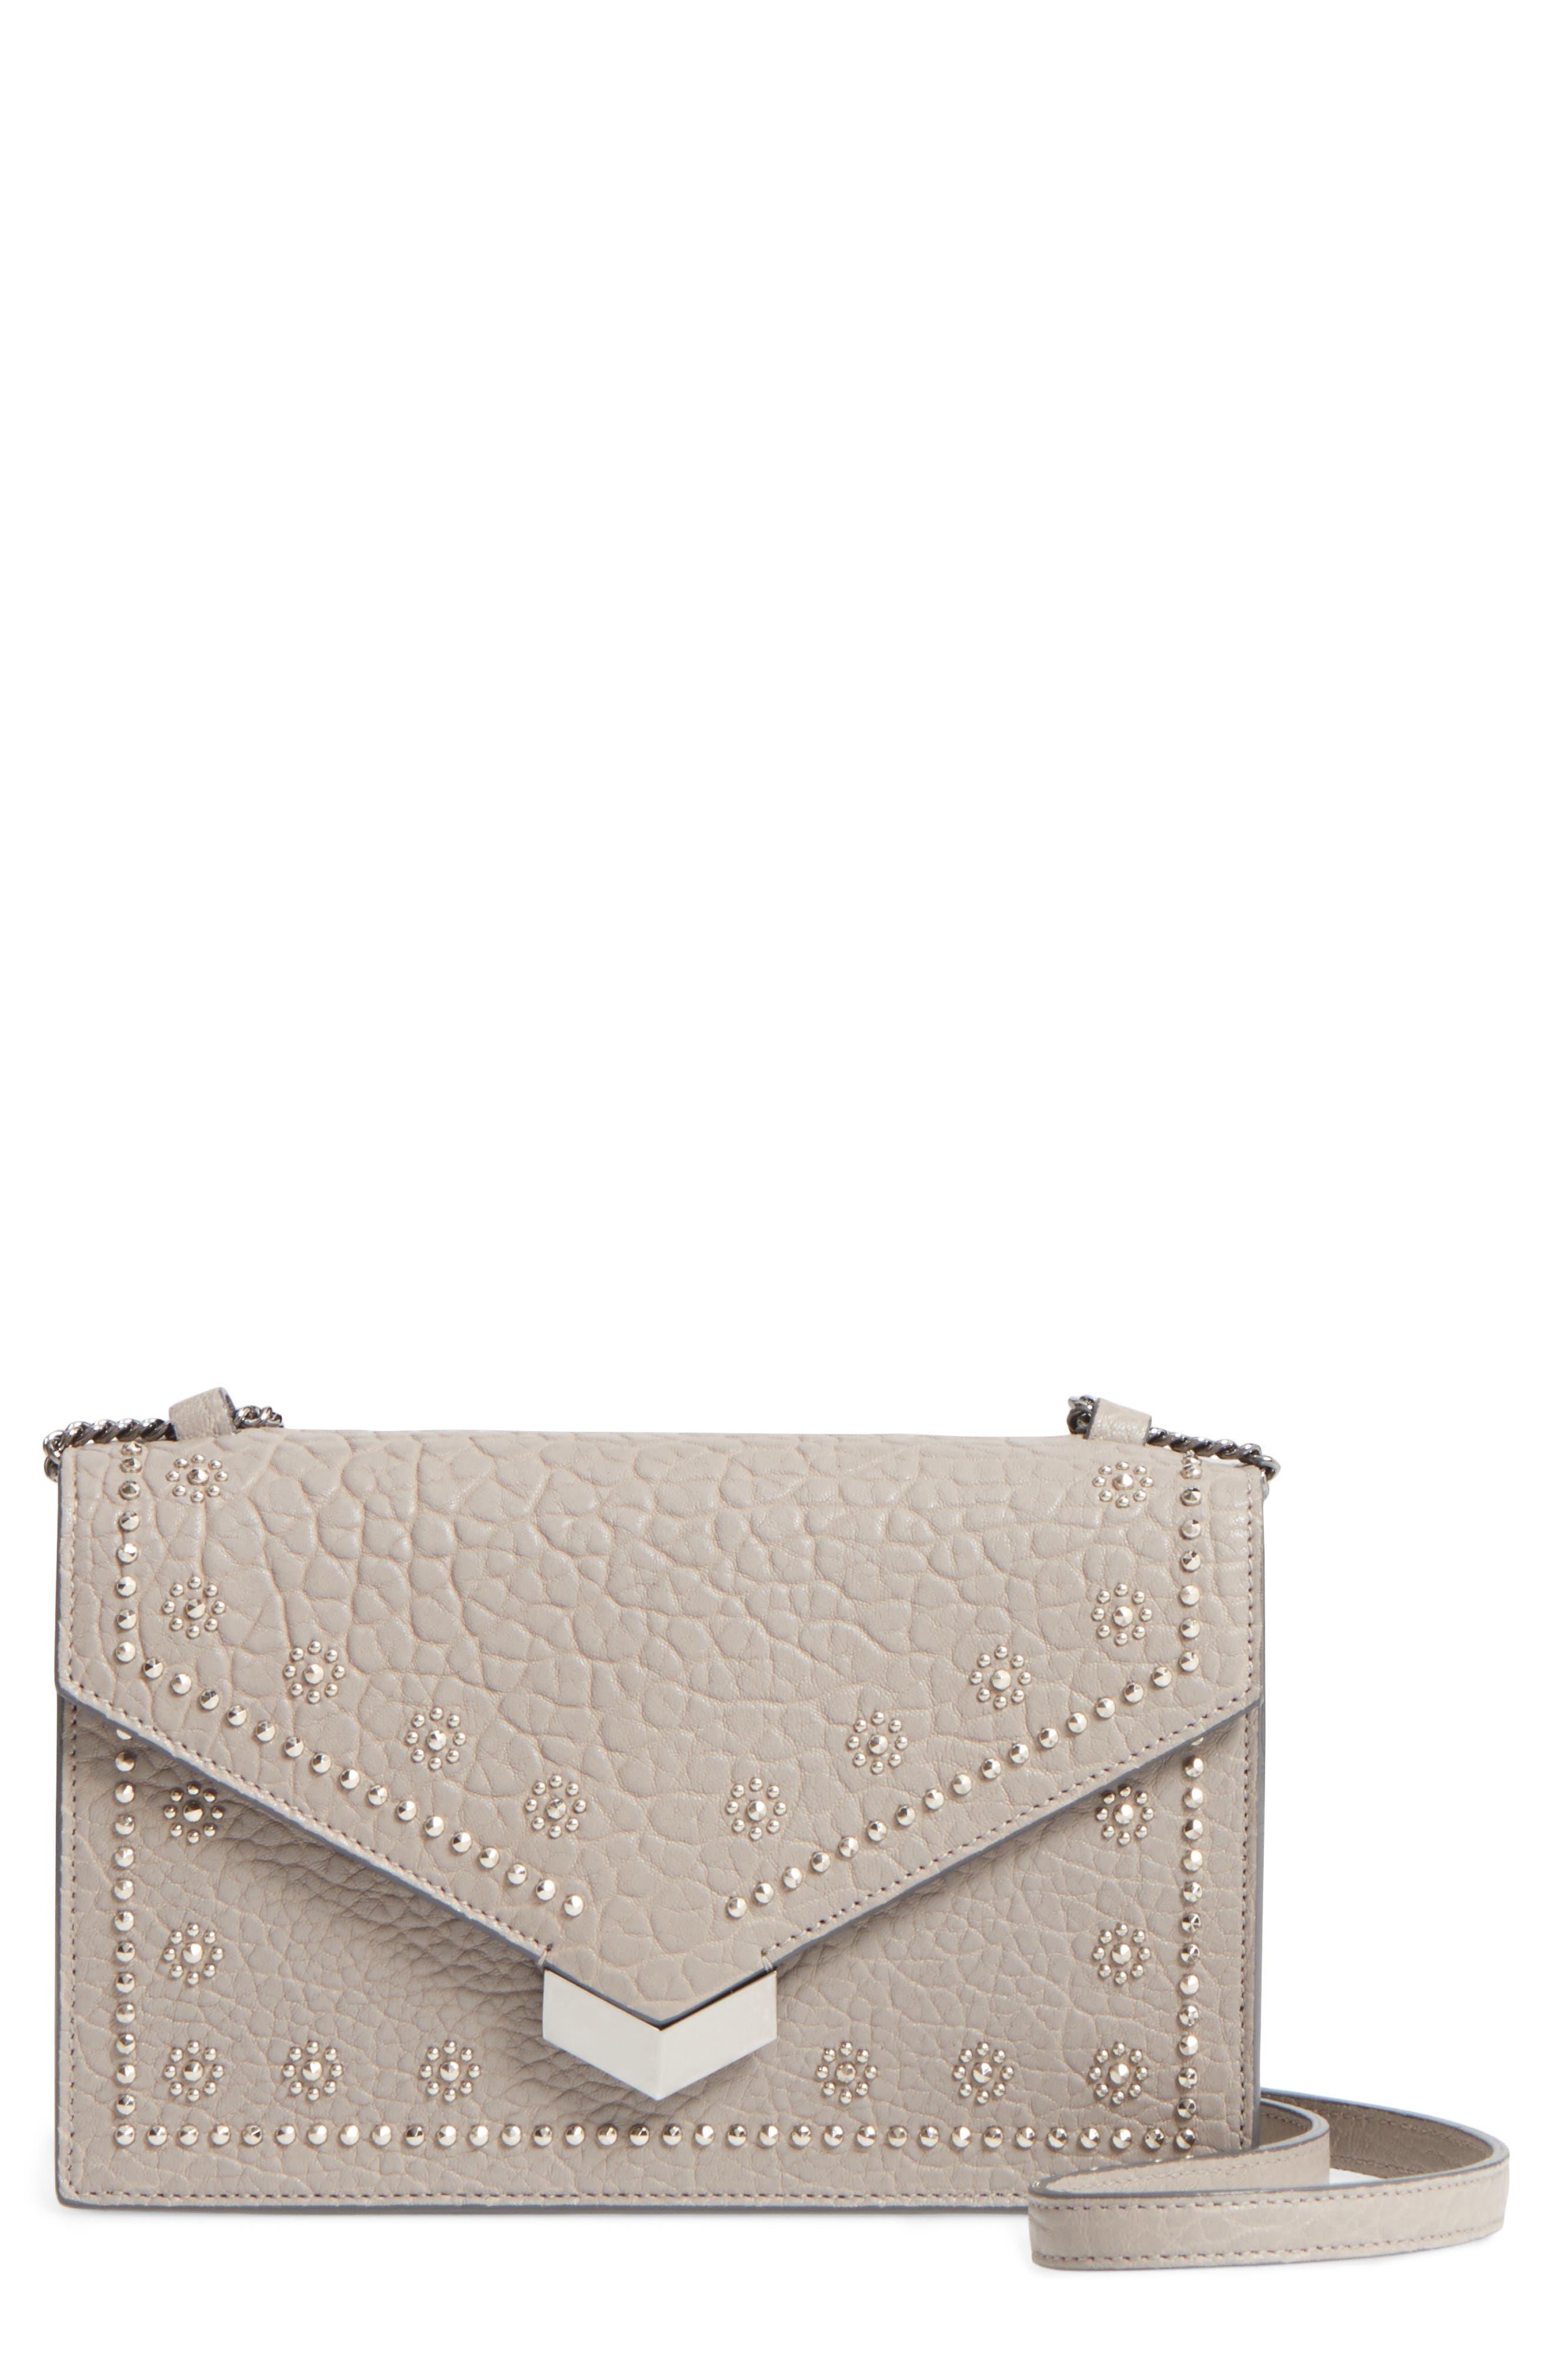 Leila Grainy Lambskin Leather Crossbody Bag,                             Main thumbnail 1, color,                             040